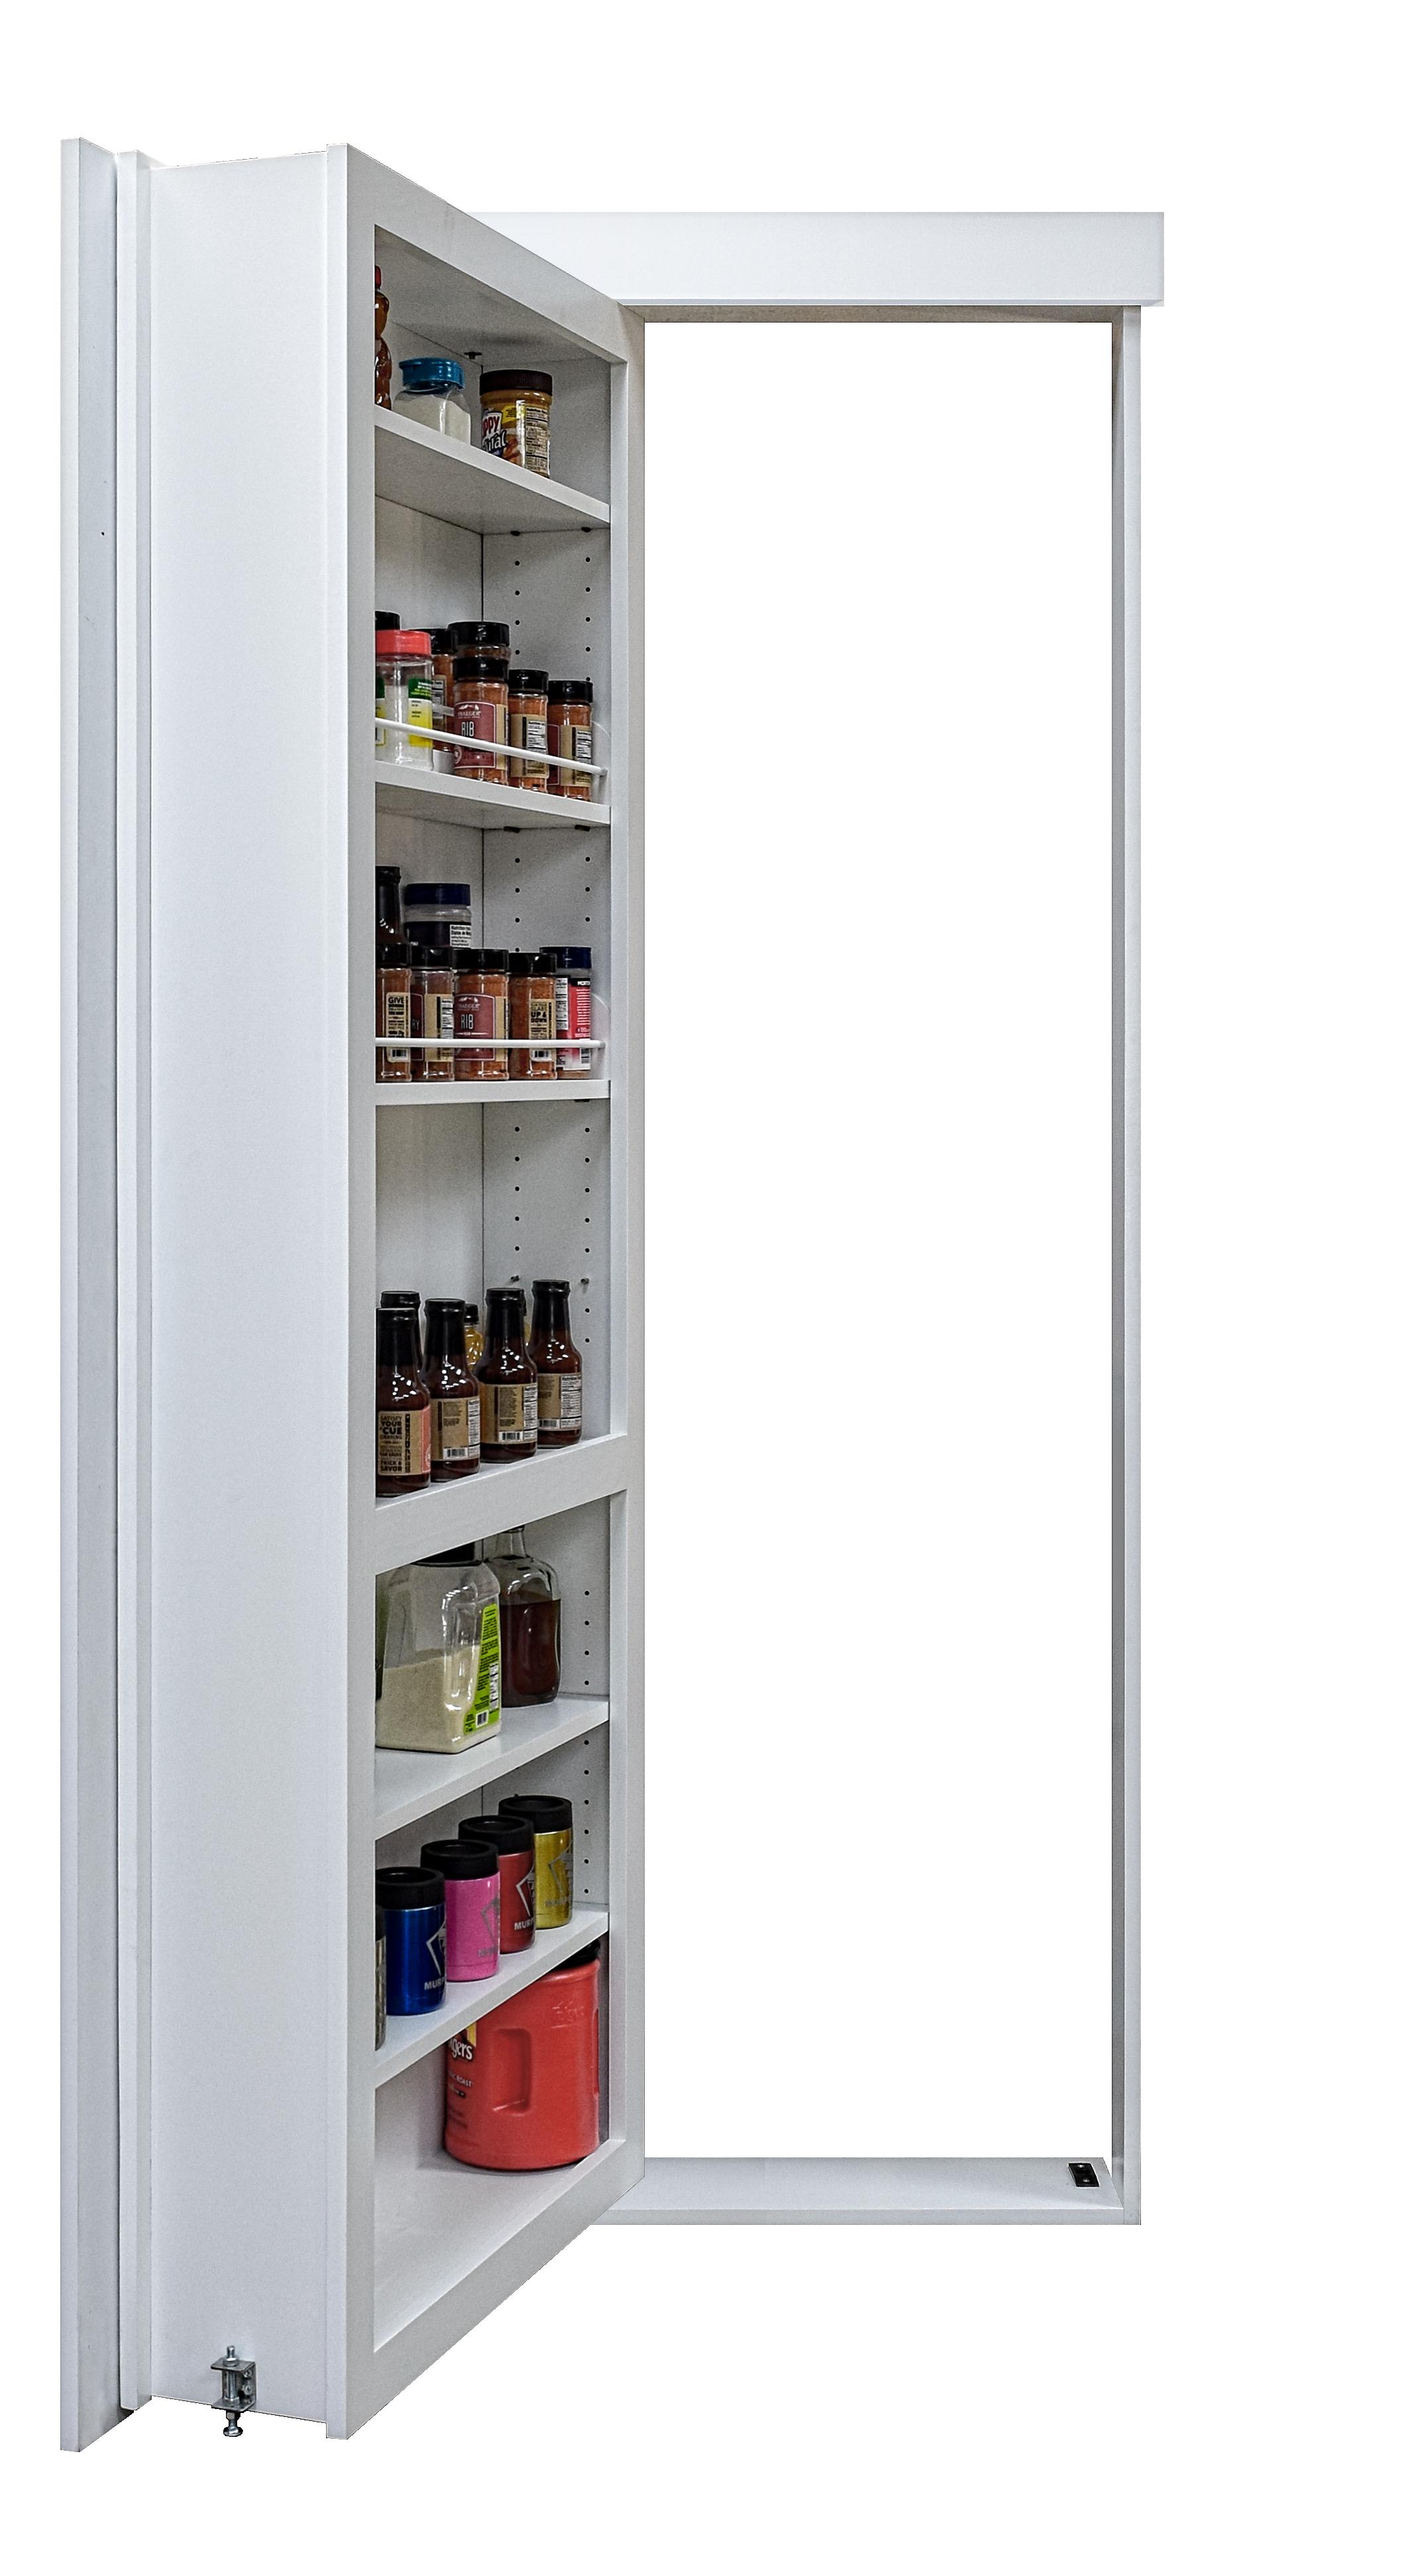 Pantry Door (Reversed) | Pinterest